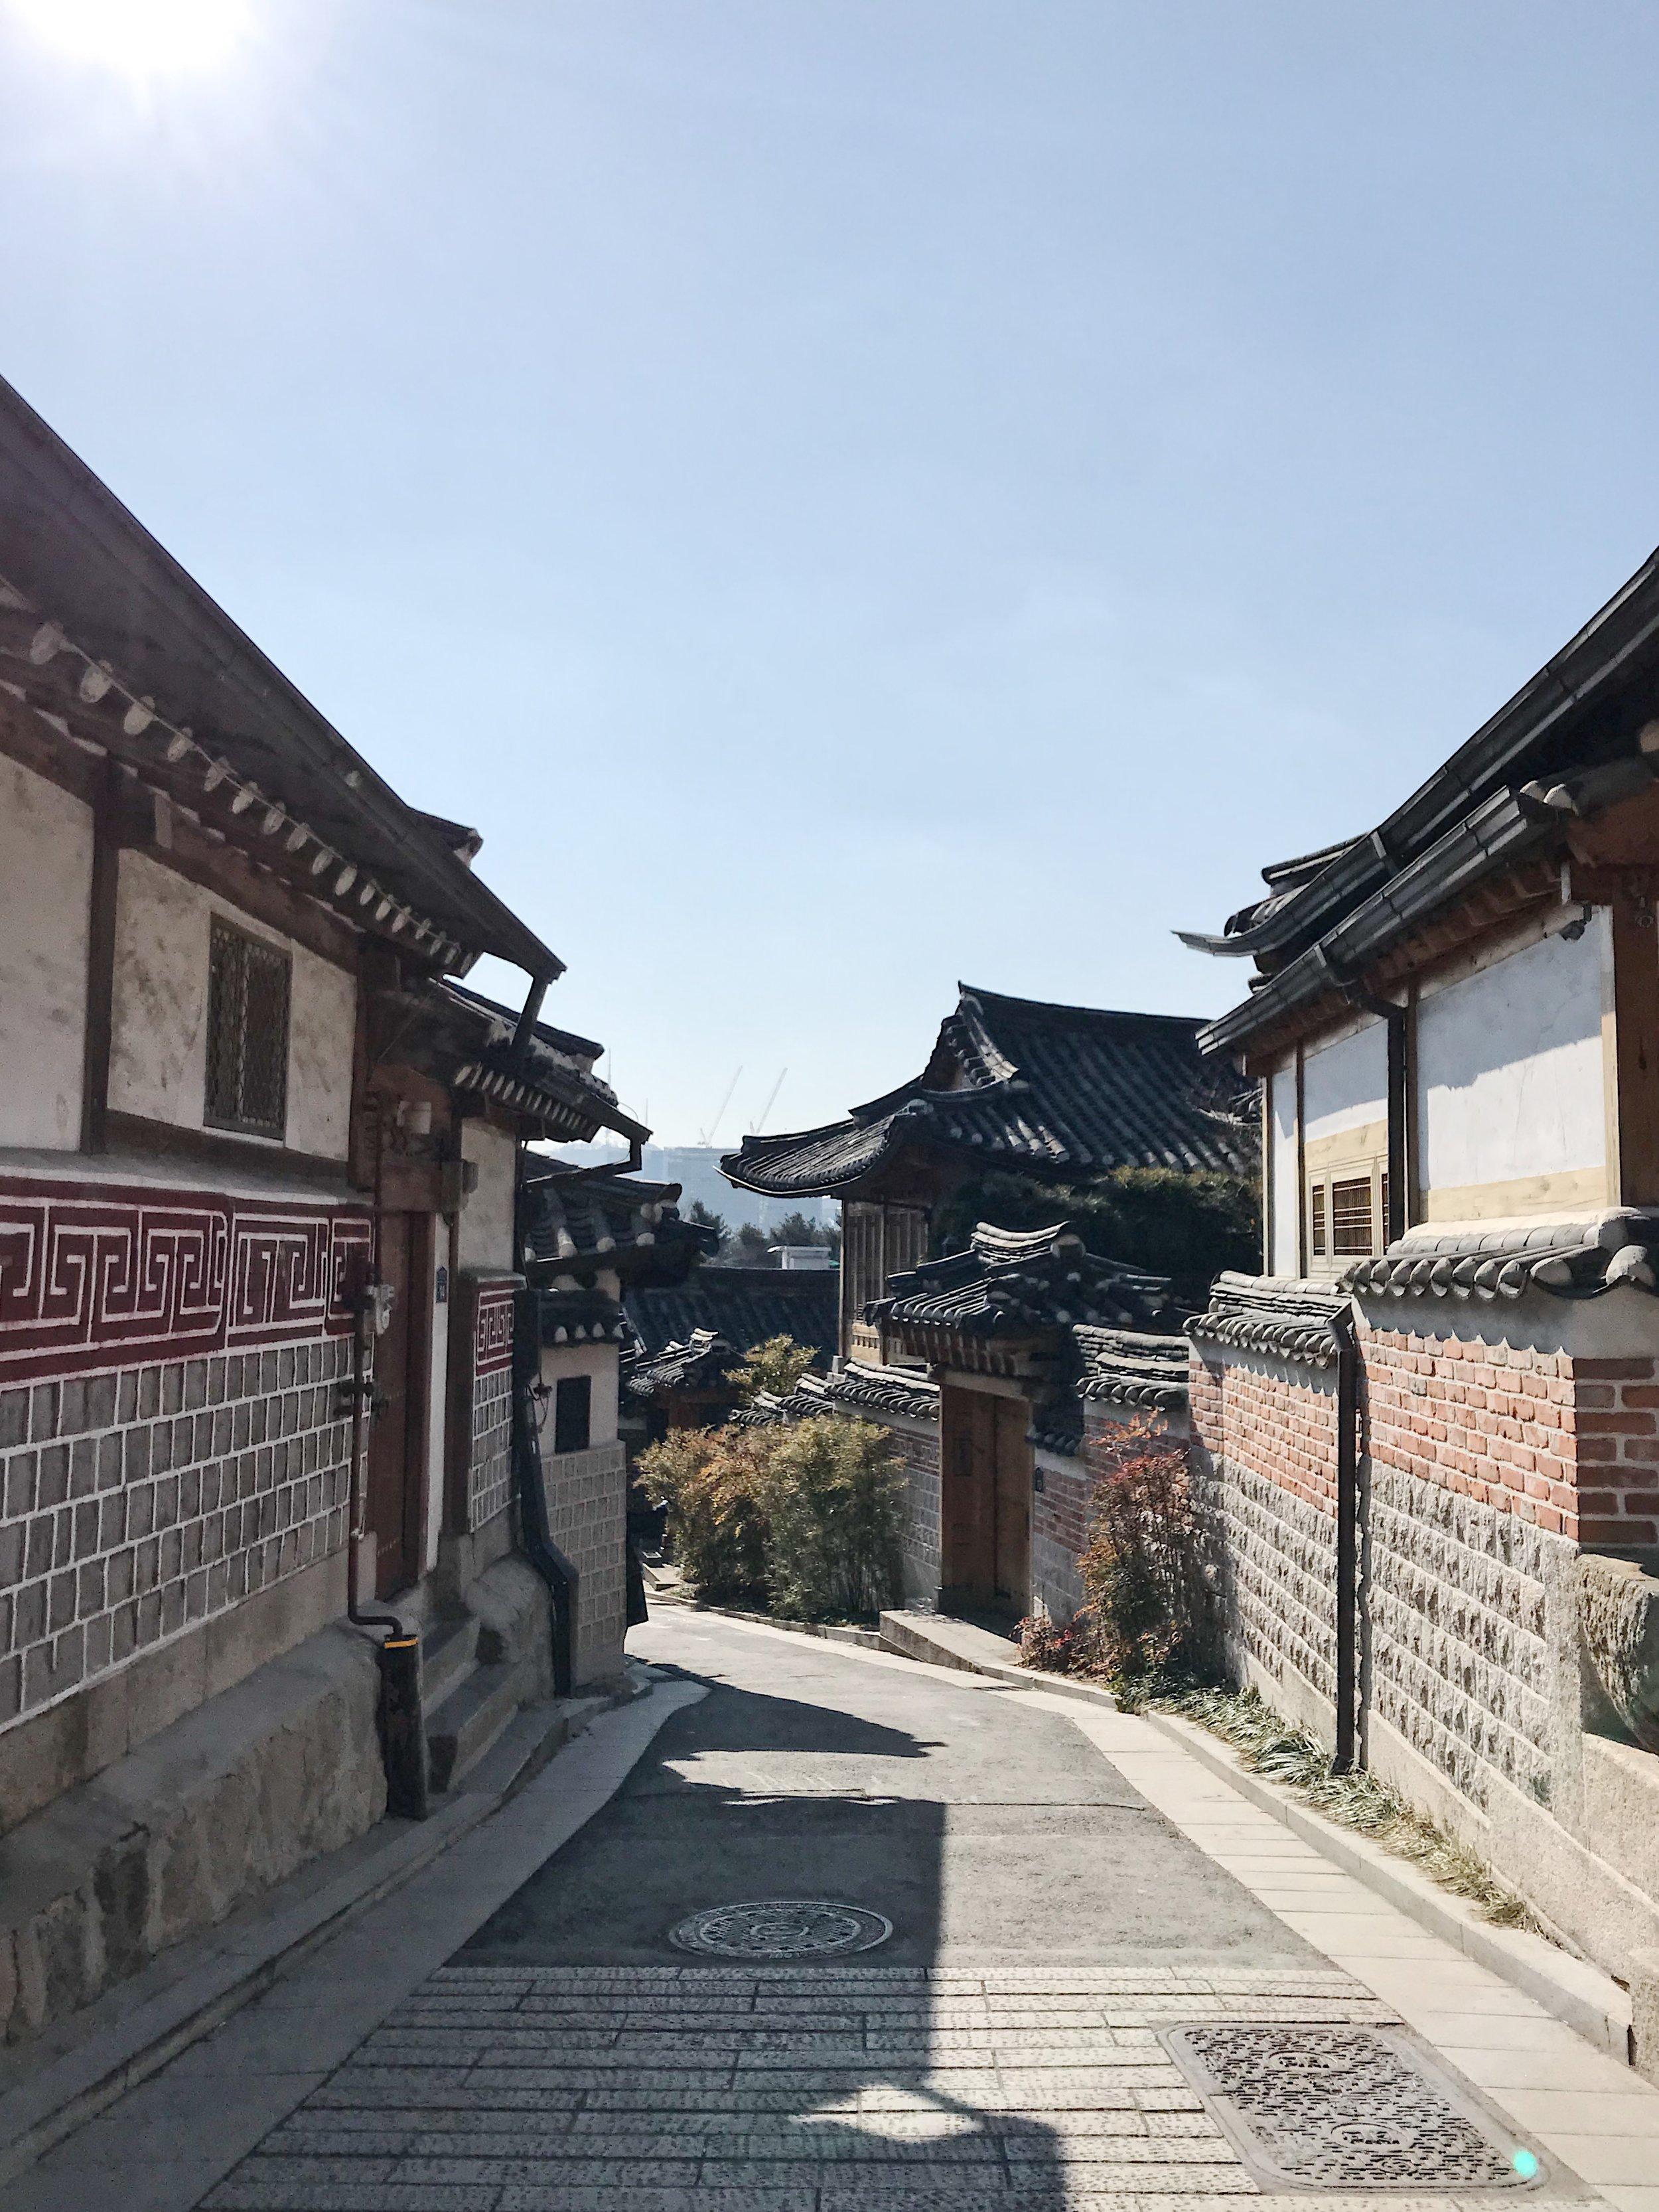 Bukchon Hanok Village 韓屋村